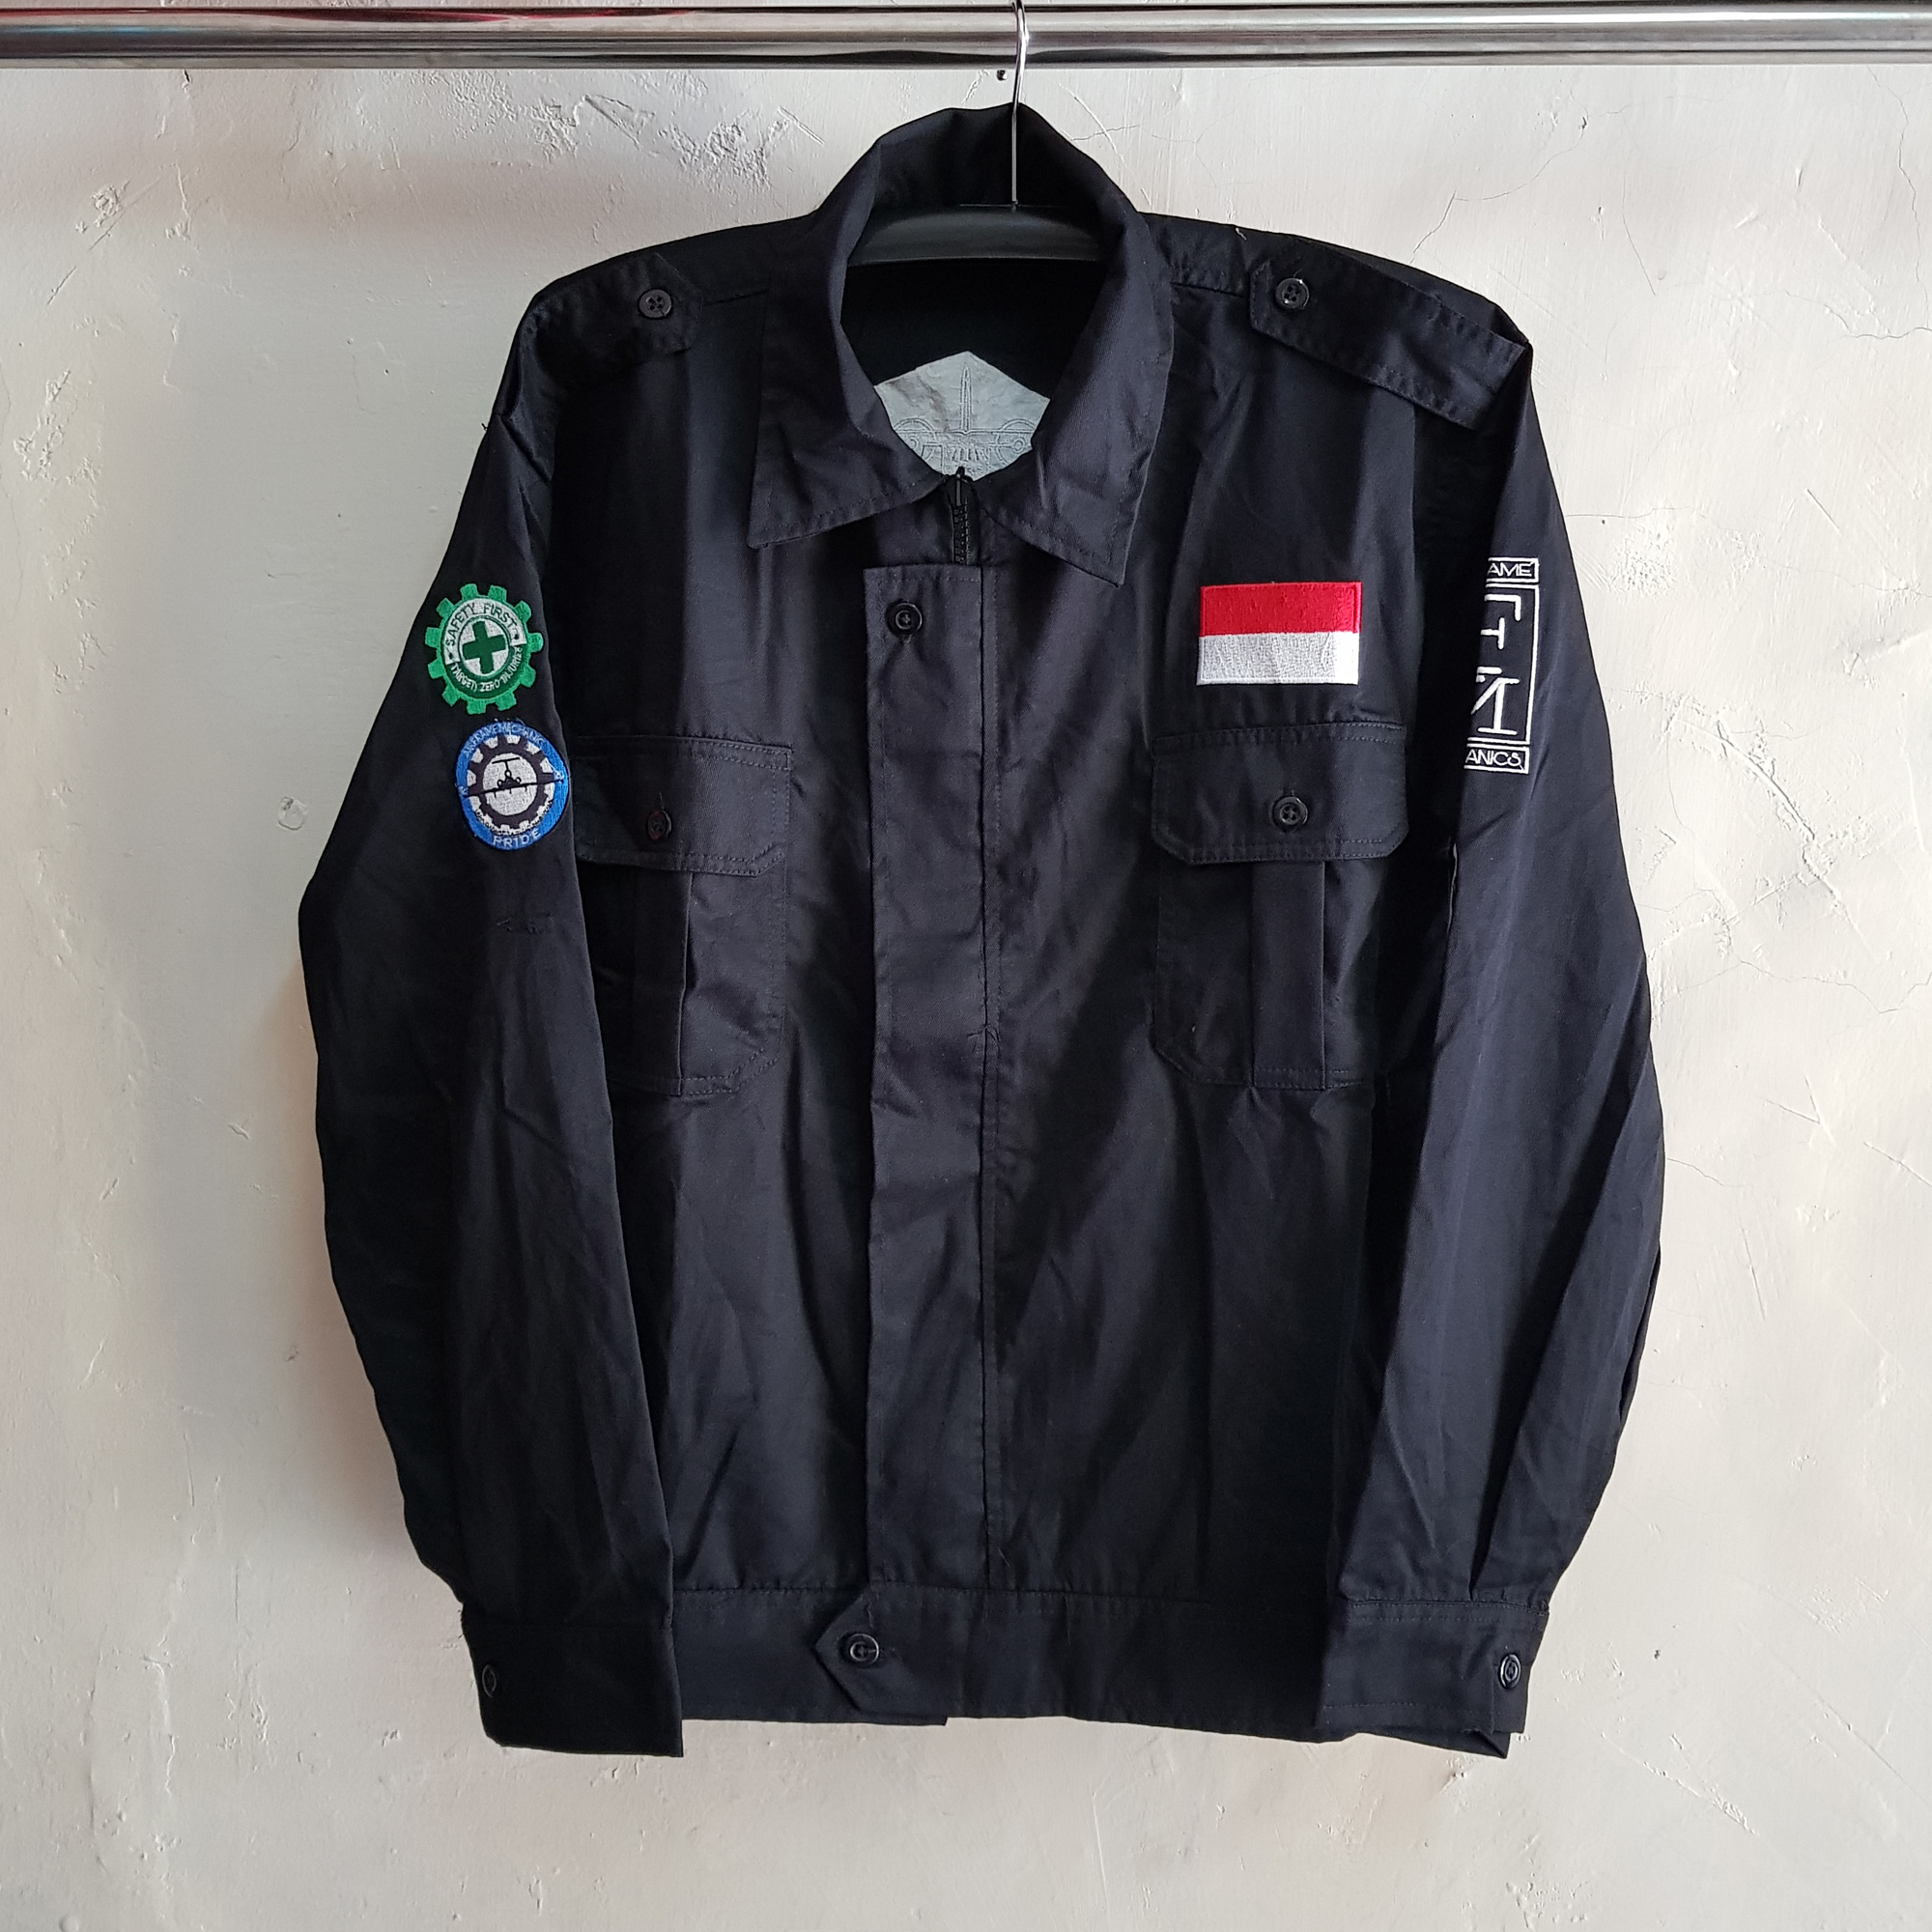 Seragam Jaket Kelas, Jaket Cotton AFM